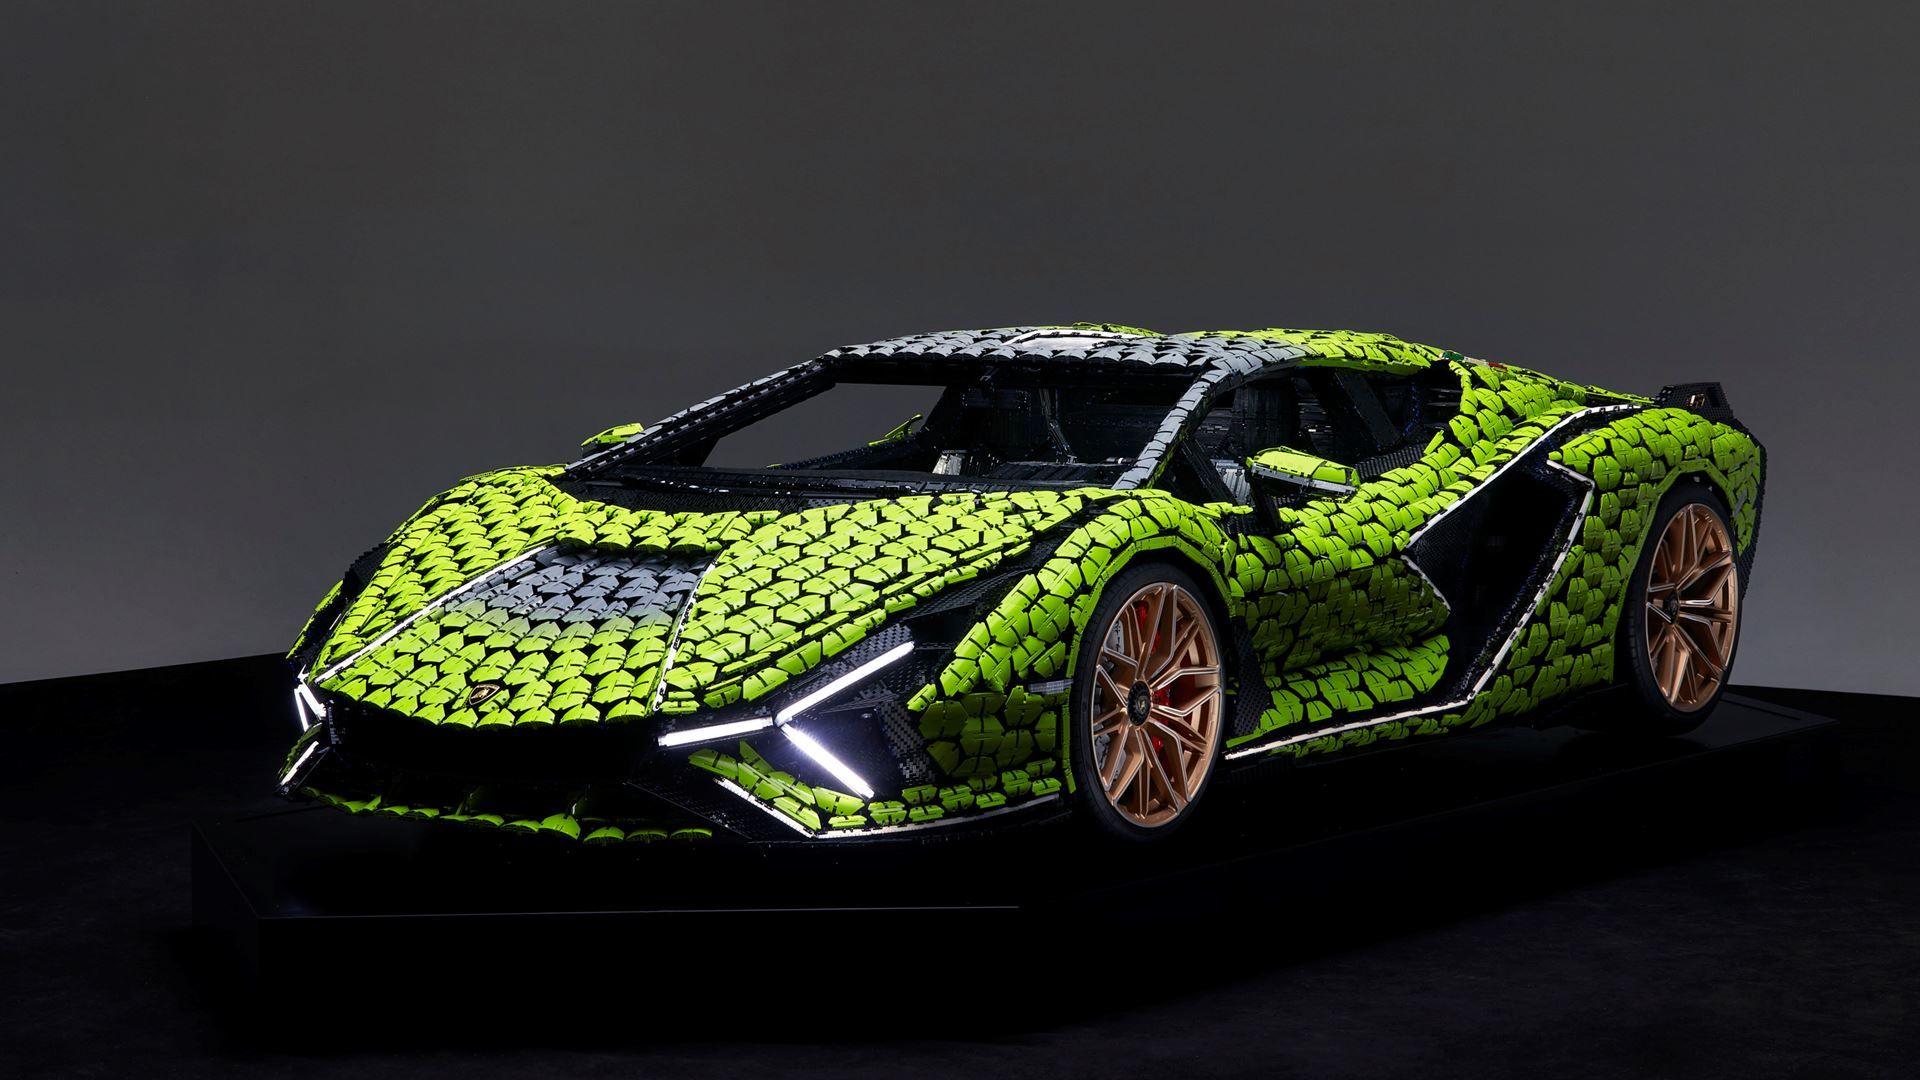 Automobili Lamborghini builds dream cars, also with LEGO® Technic™ - Life-size Lamborghini Sián FKP 37 created from over 400,000 LEGO® elements - Image 5